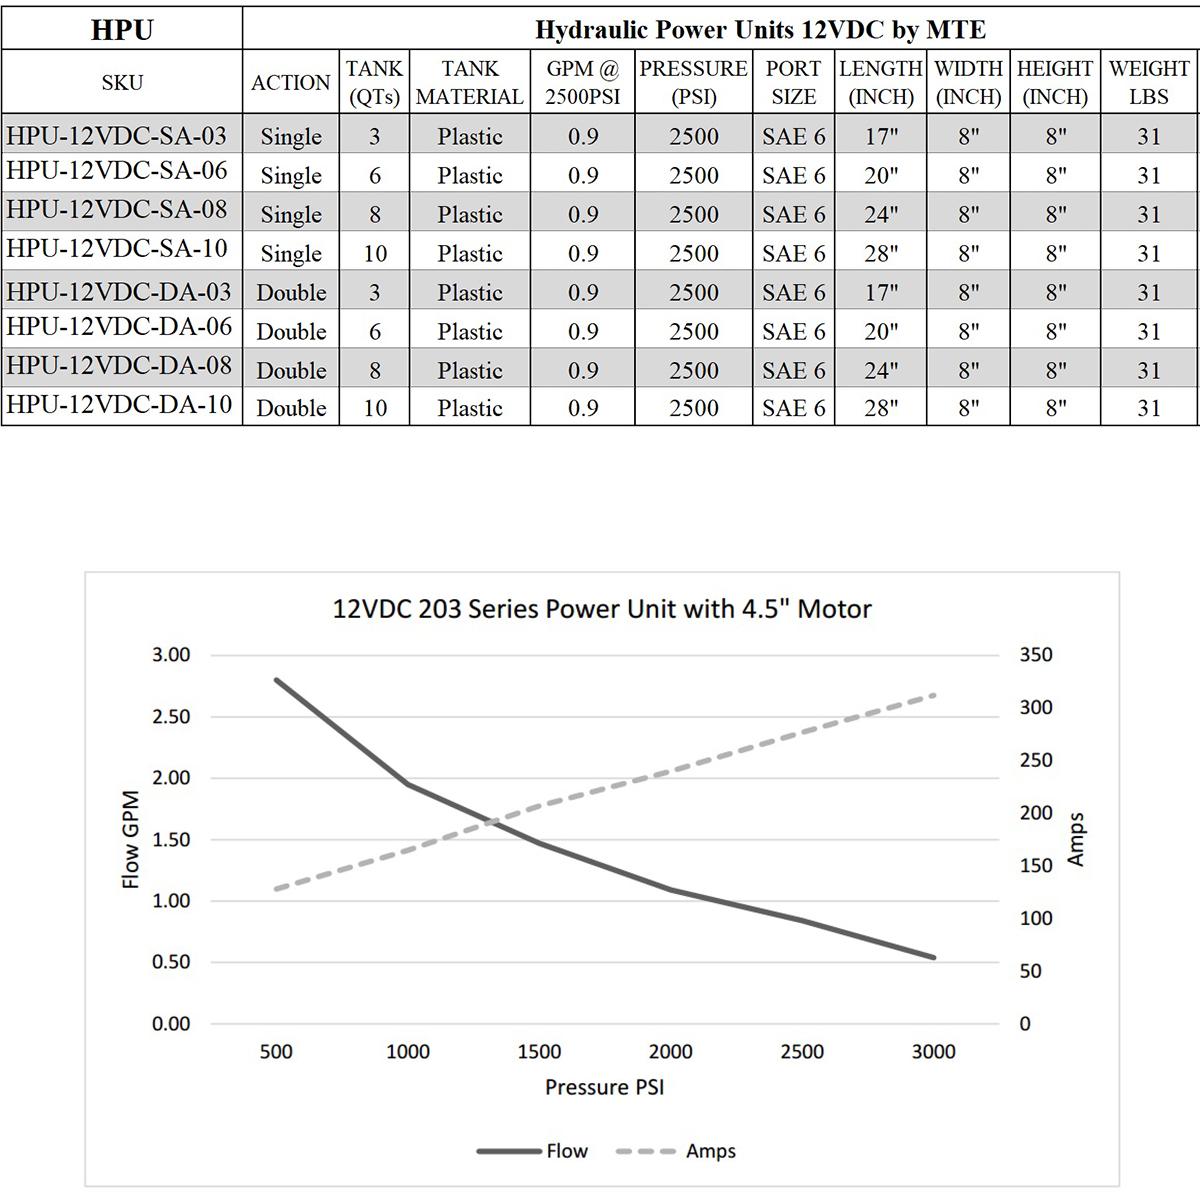 single acting 10 quarts hydraulic power unit 12V DC by MTE